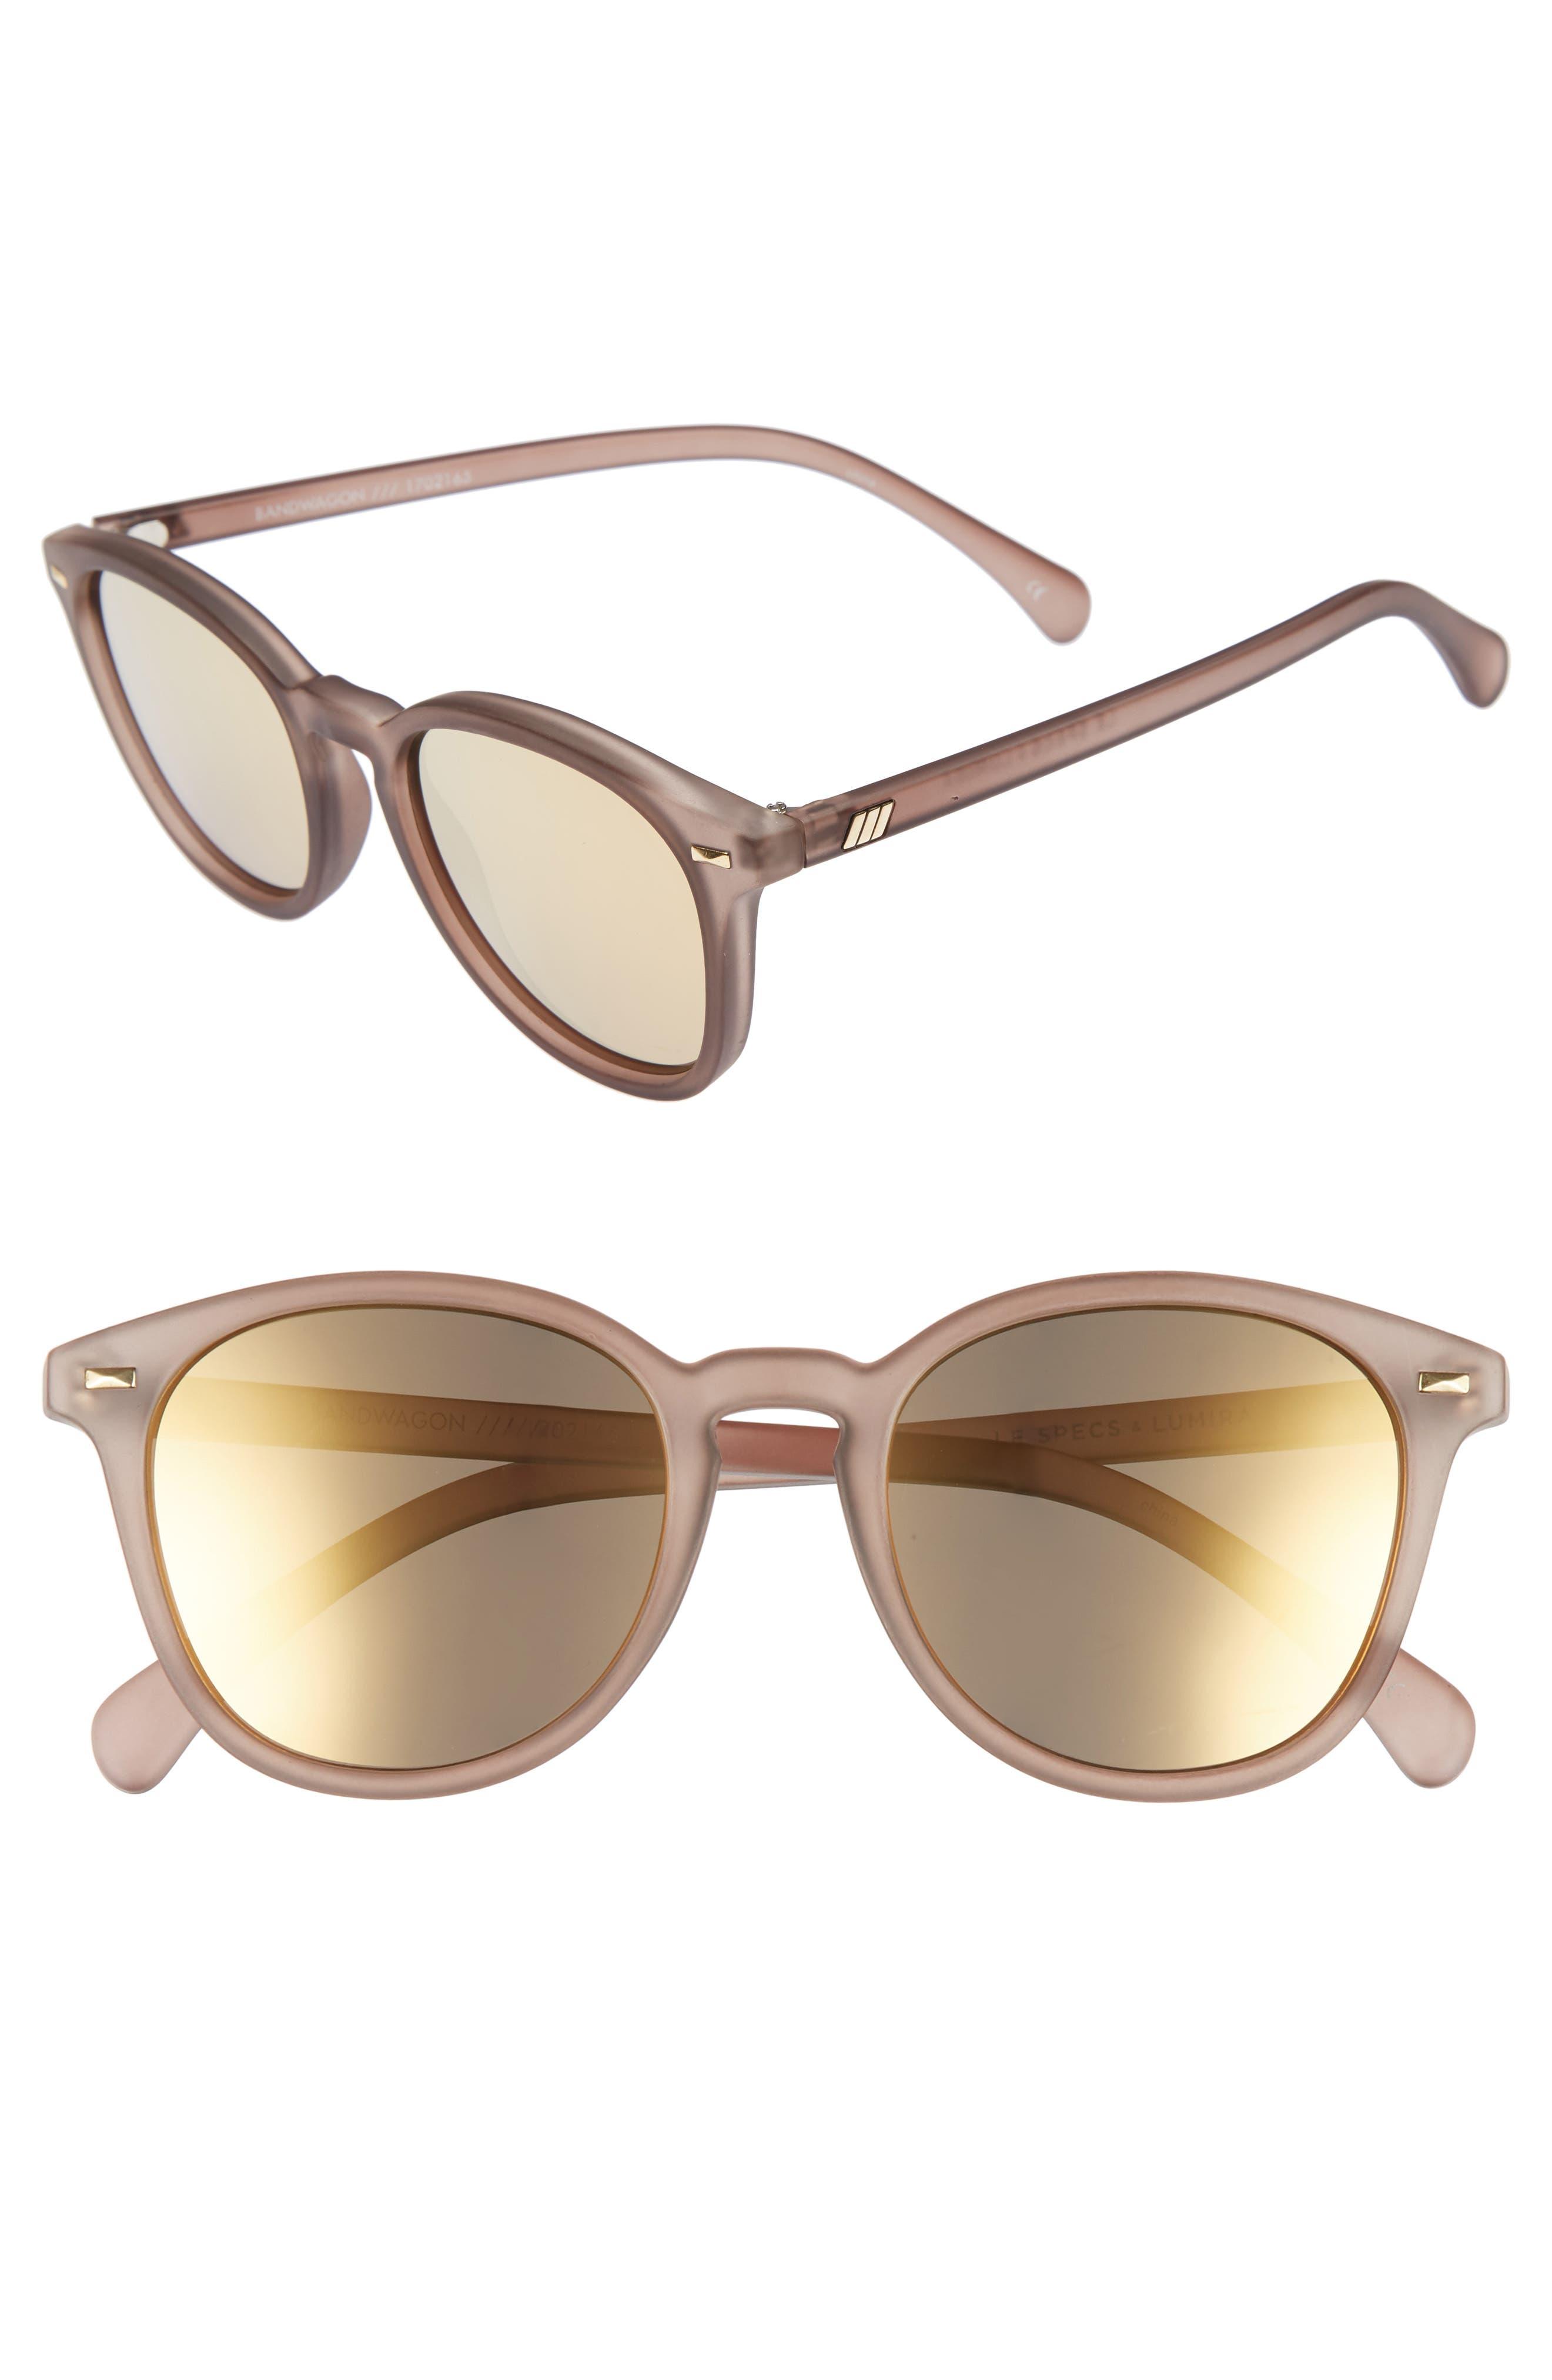 Alternate Image 1 Selected - Le Specs x Lumira Bandwagon 51mm Sunglasses & Candle Gift Set